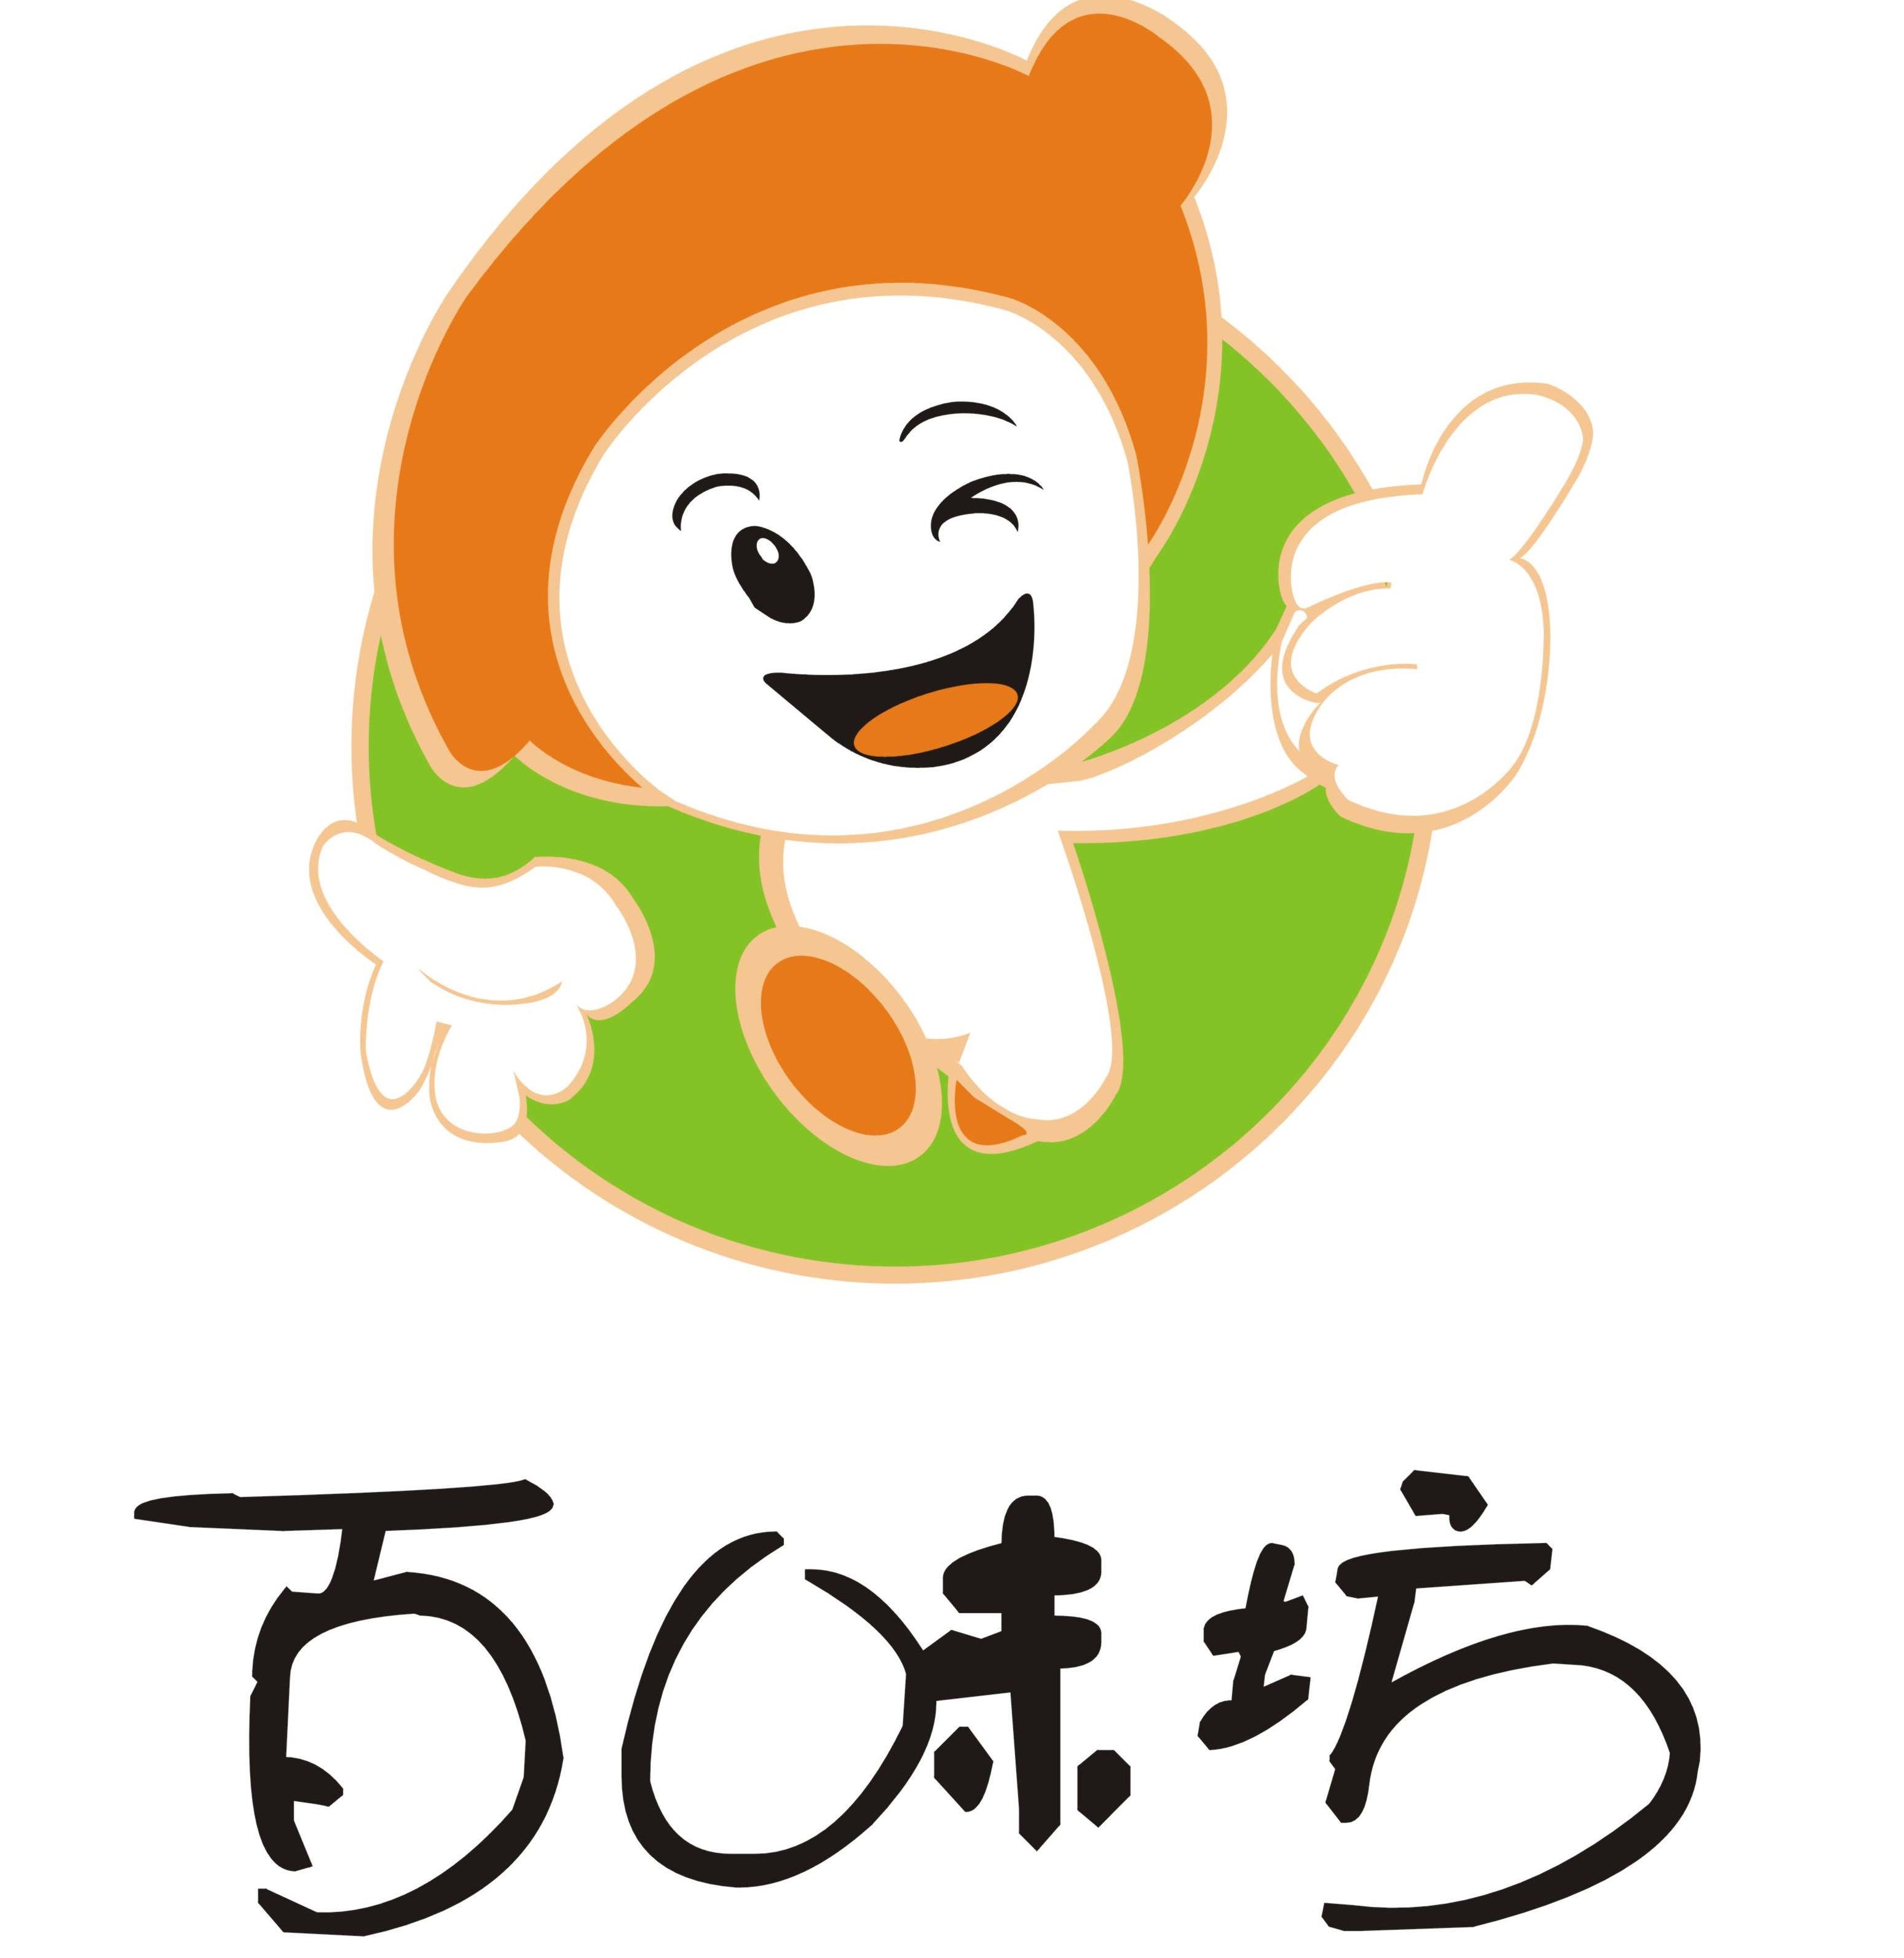 零食店的可爱logo